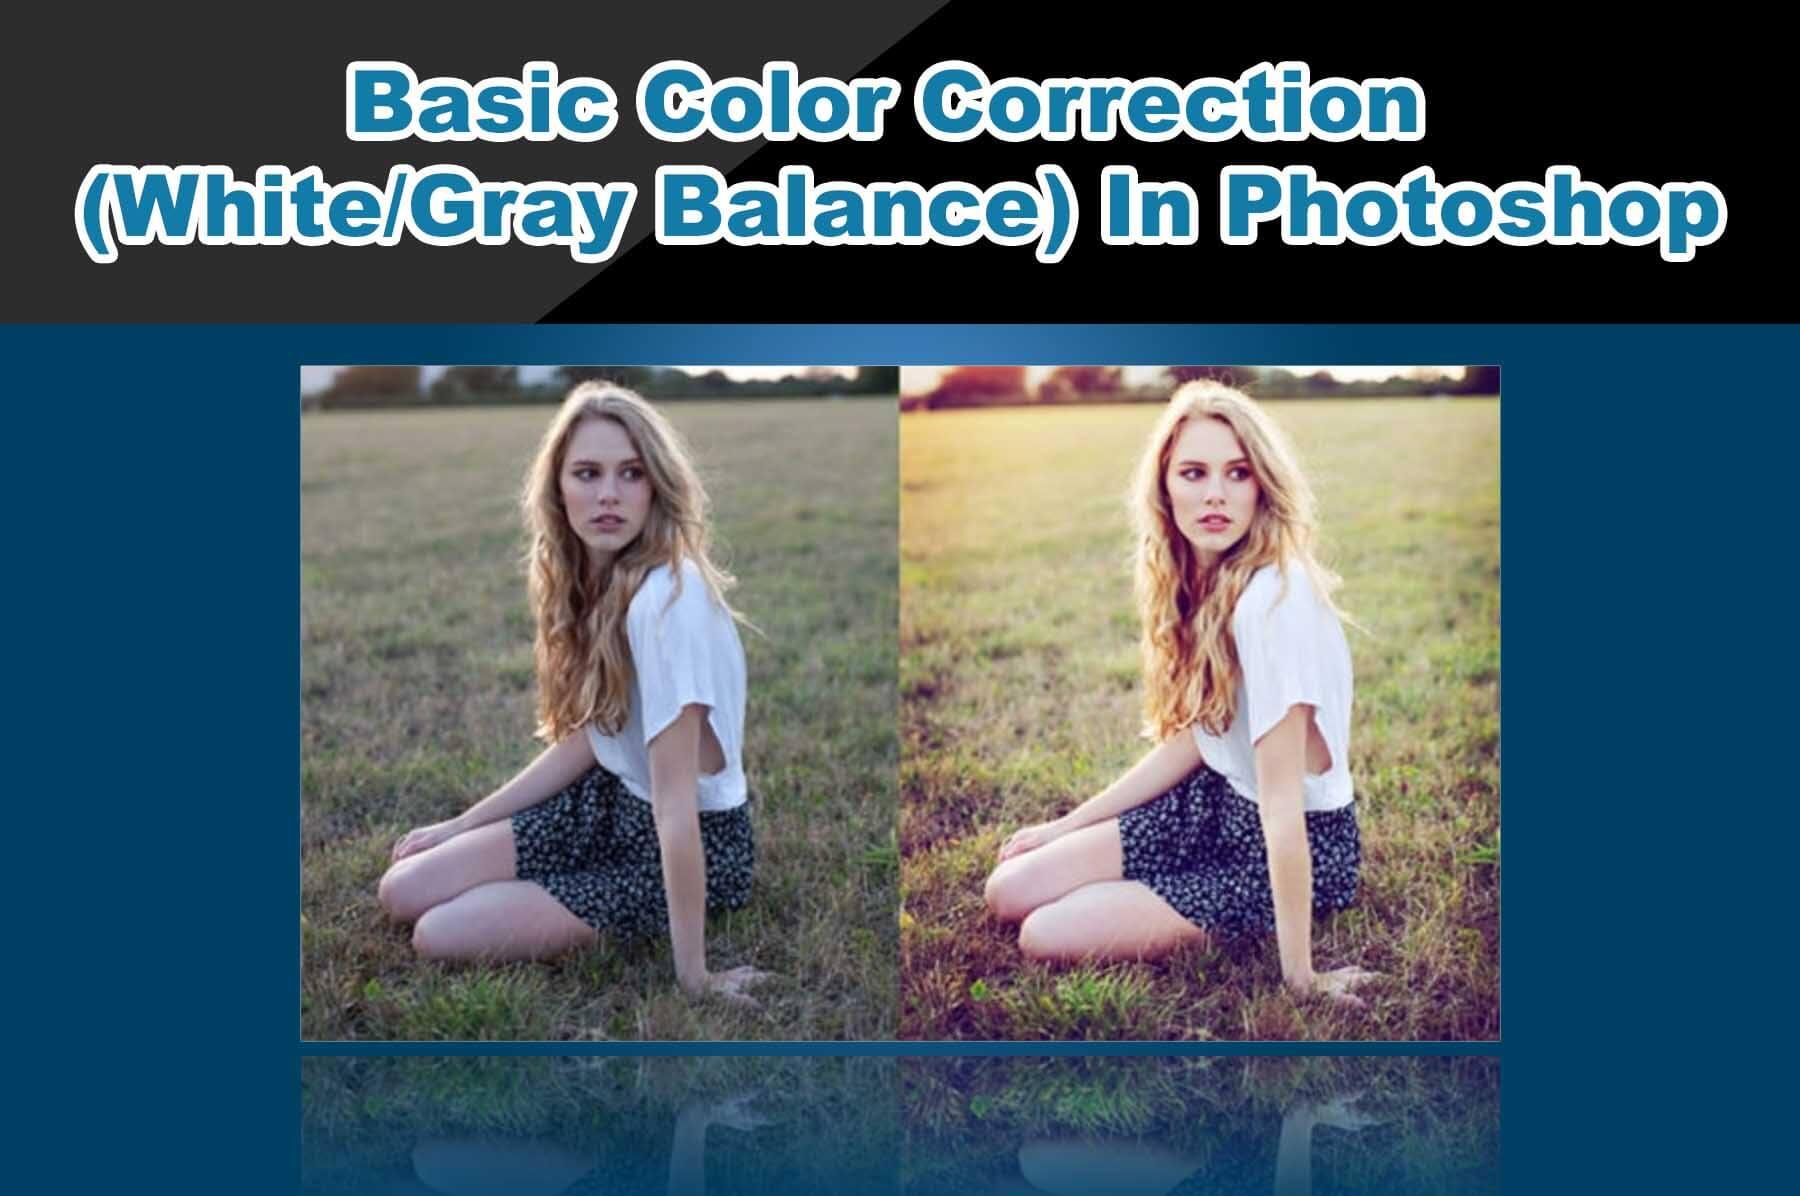 Basic Color Correction (White/Gray Balance) In Photoshop